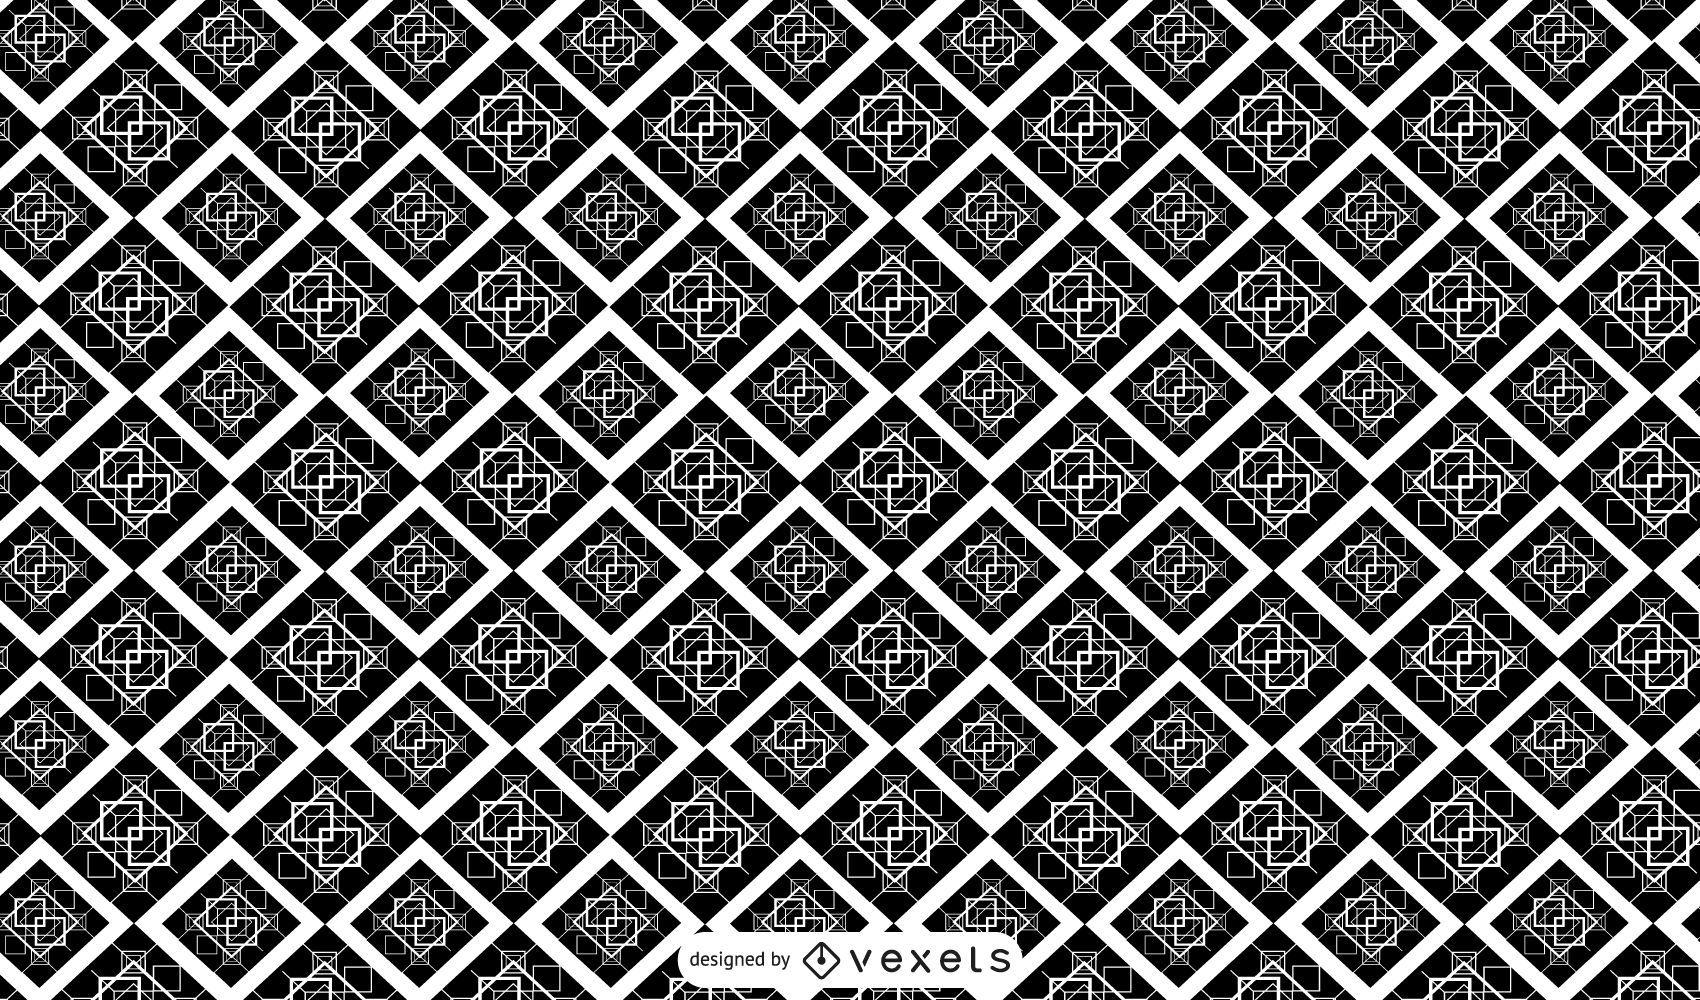 Geometric abstract pattern design